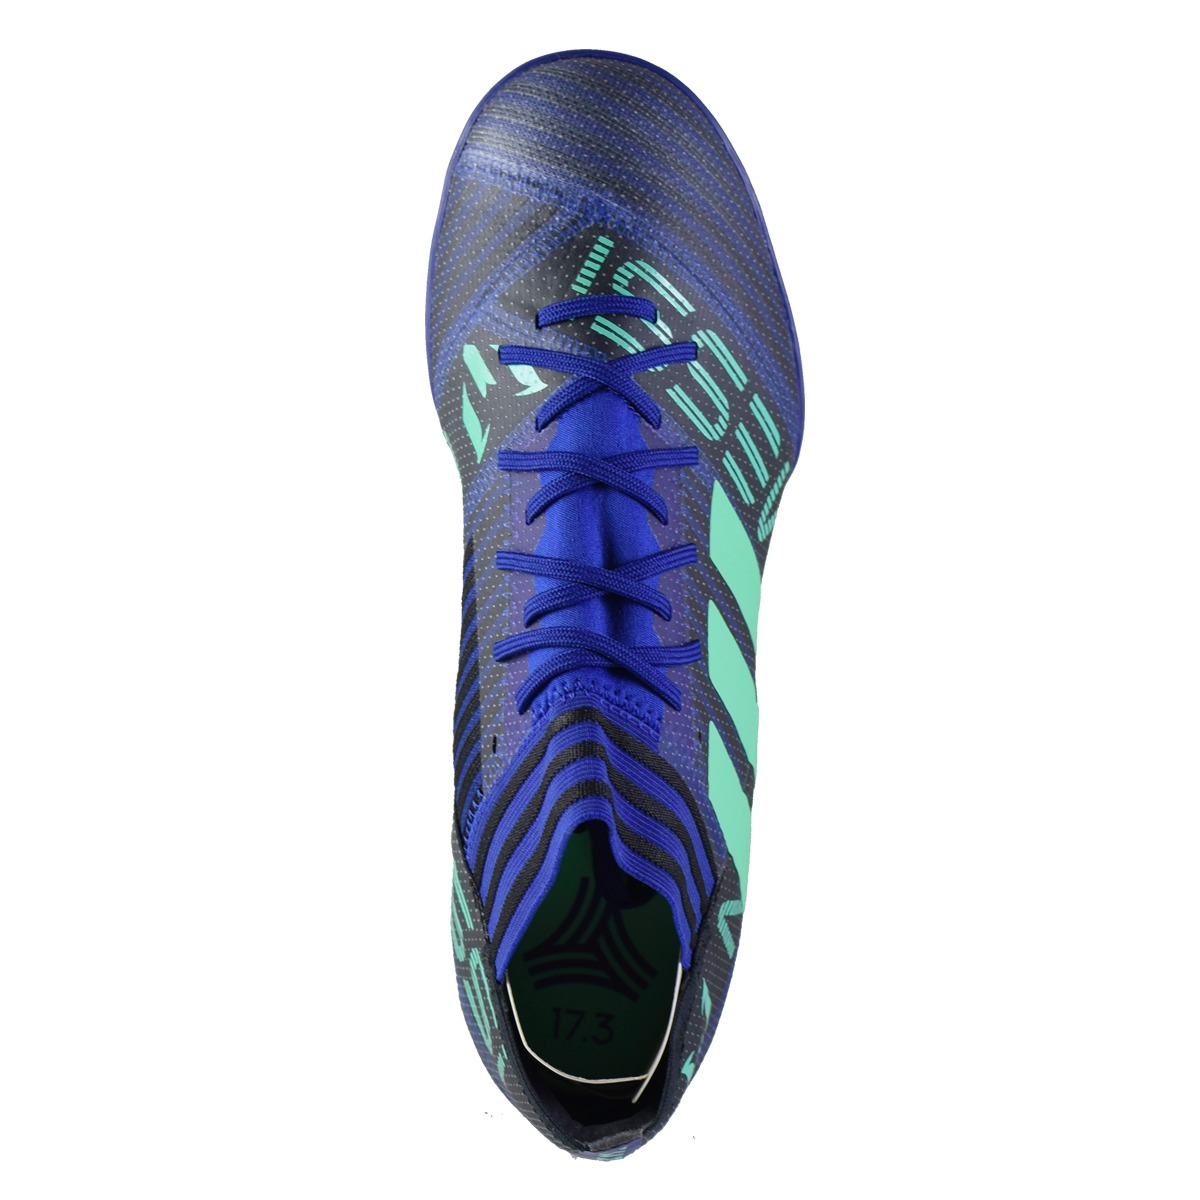 botines adidas nemeziz messi tango 17.3 césped artificial ho. Cargando zoom. dd8ad69de3c5c